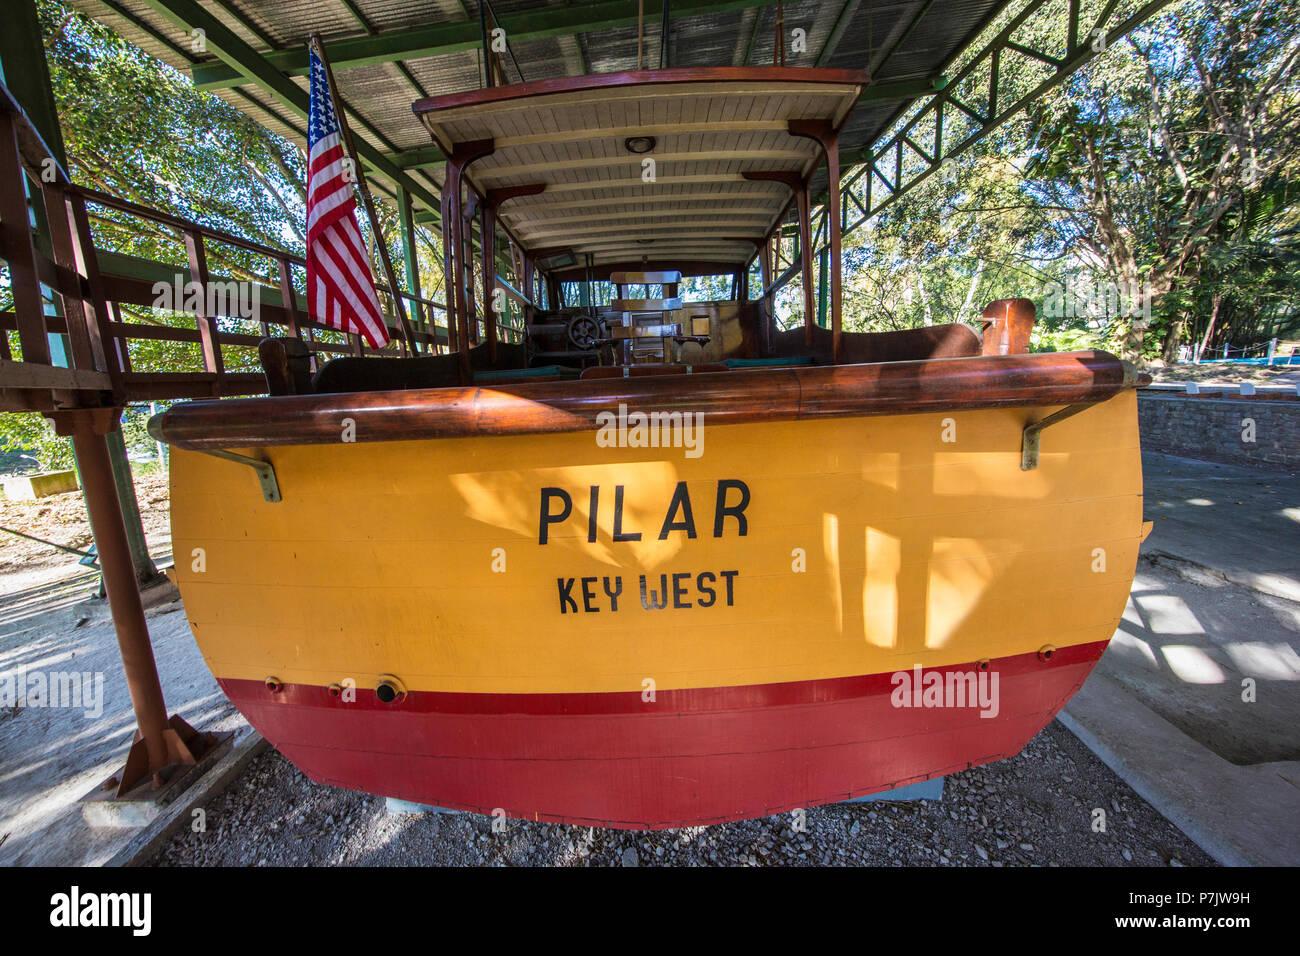 Ernest Hemingway's boat named Pilar at Finca Vigía, in San Francisco de Paula Ward in Havana, Cuba Stock Photo